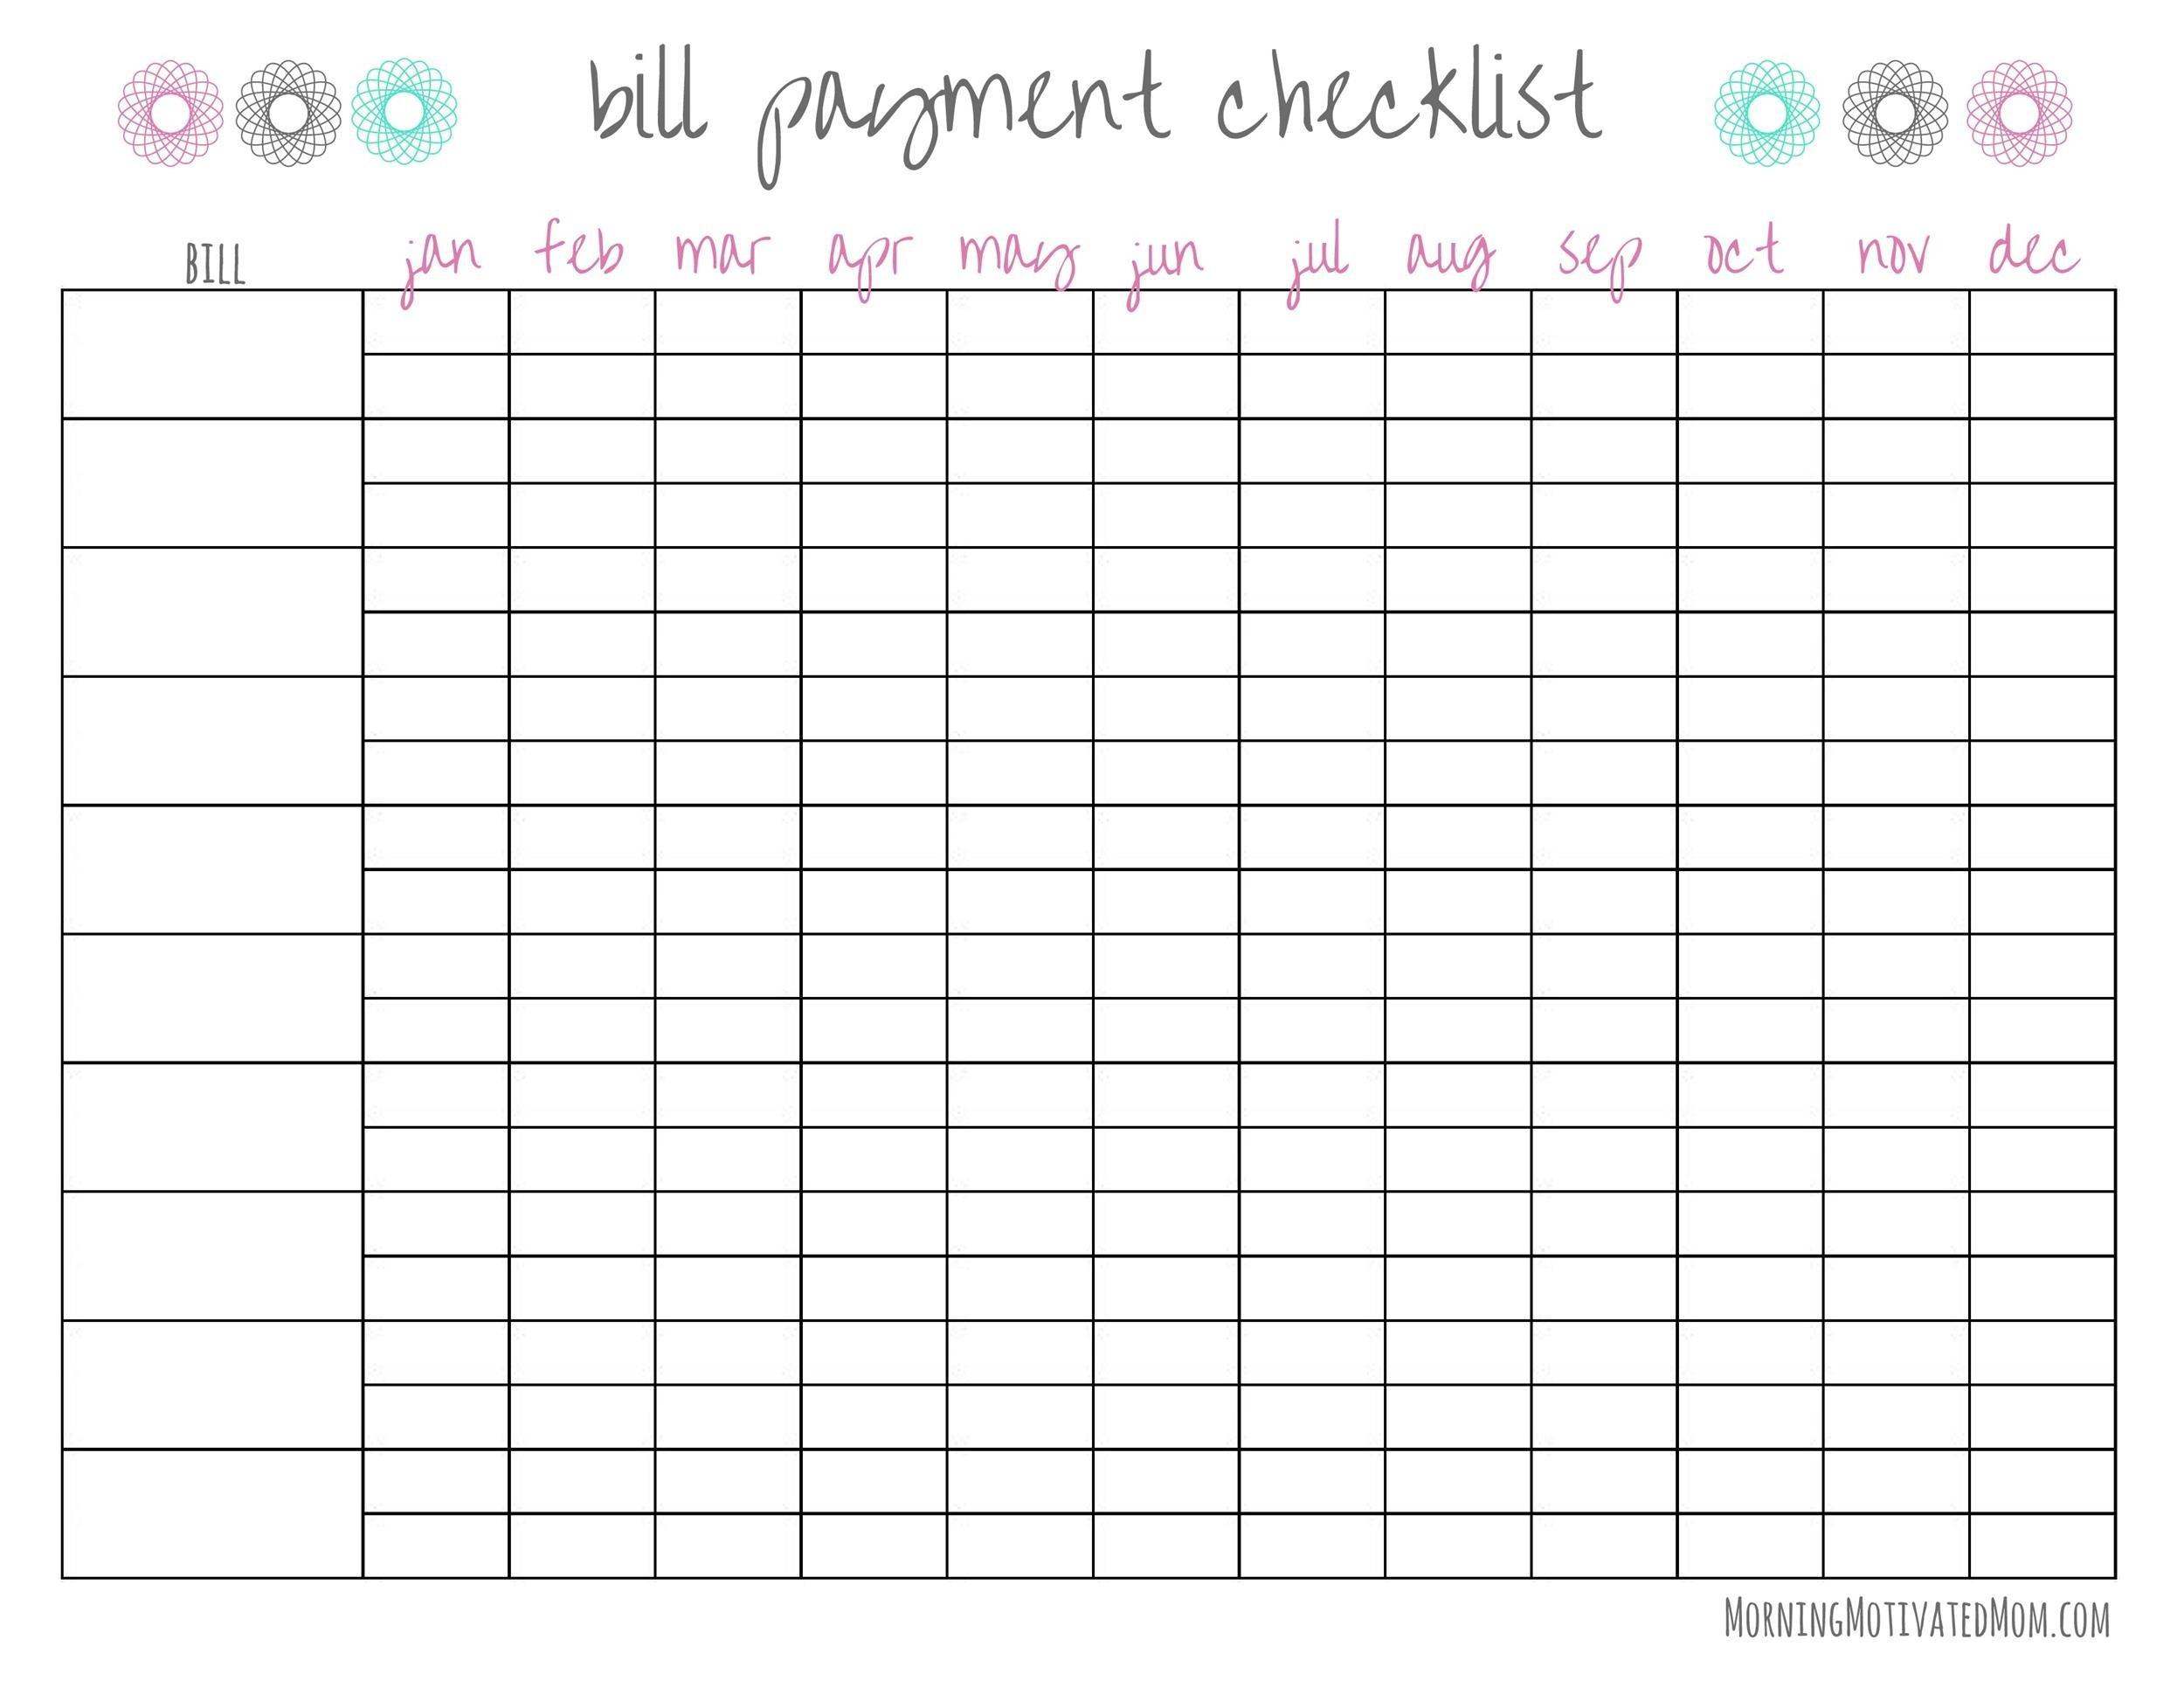 33 Free Bill Pay Checklists & Bill Calendars (Pdf, Word & Excel)  Bill Pay Printable Checklist Templates